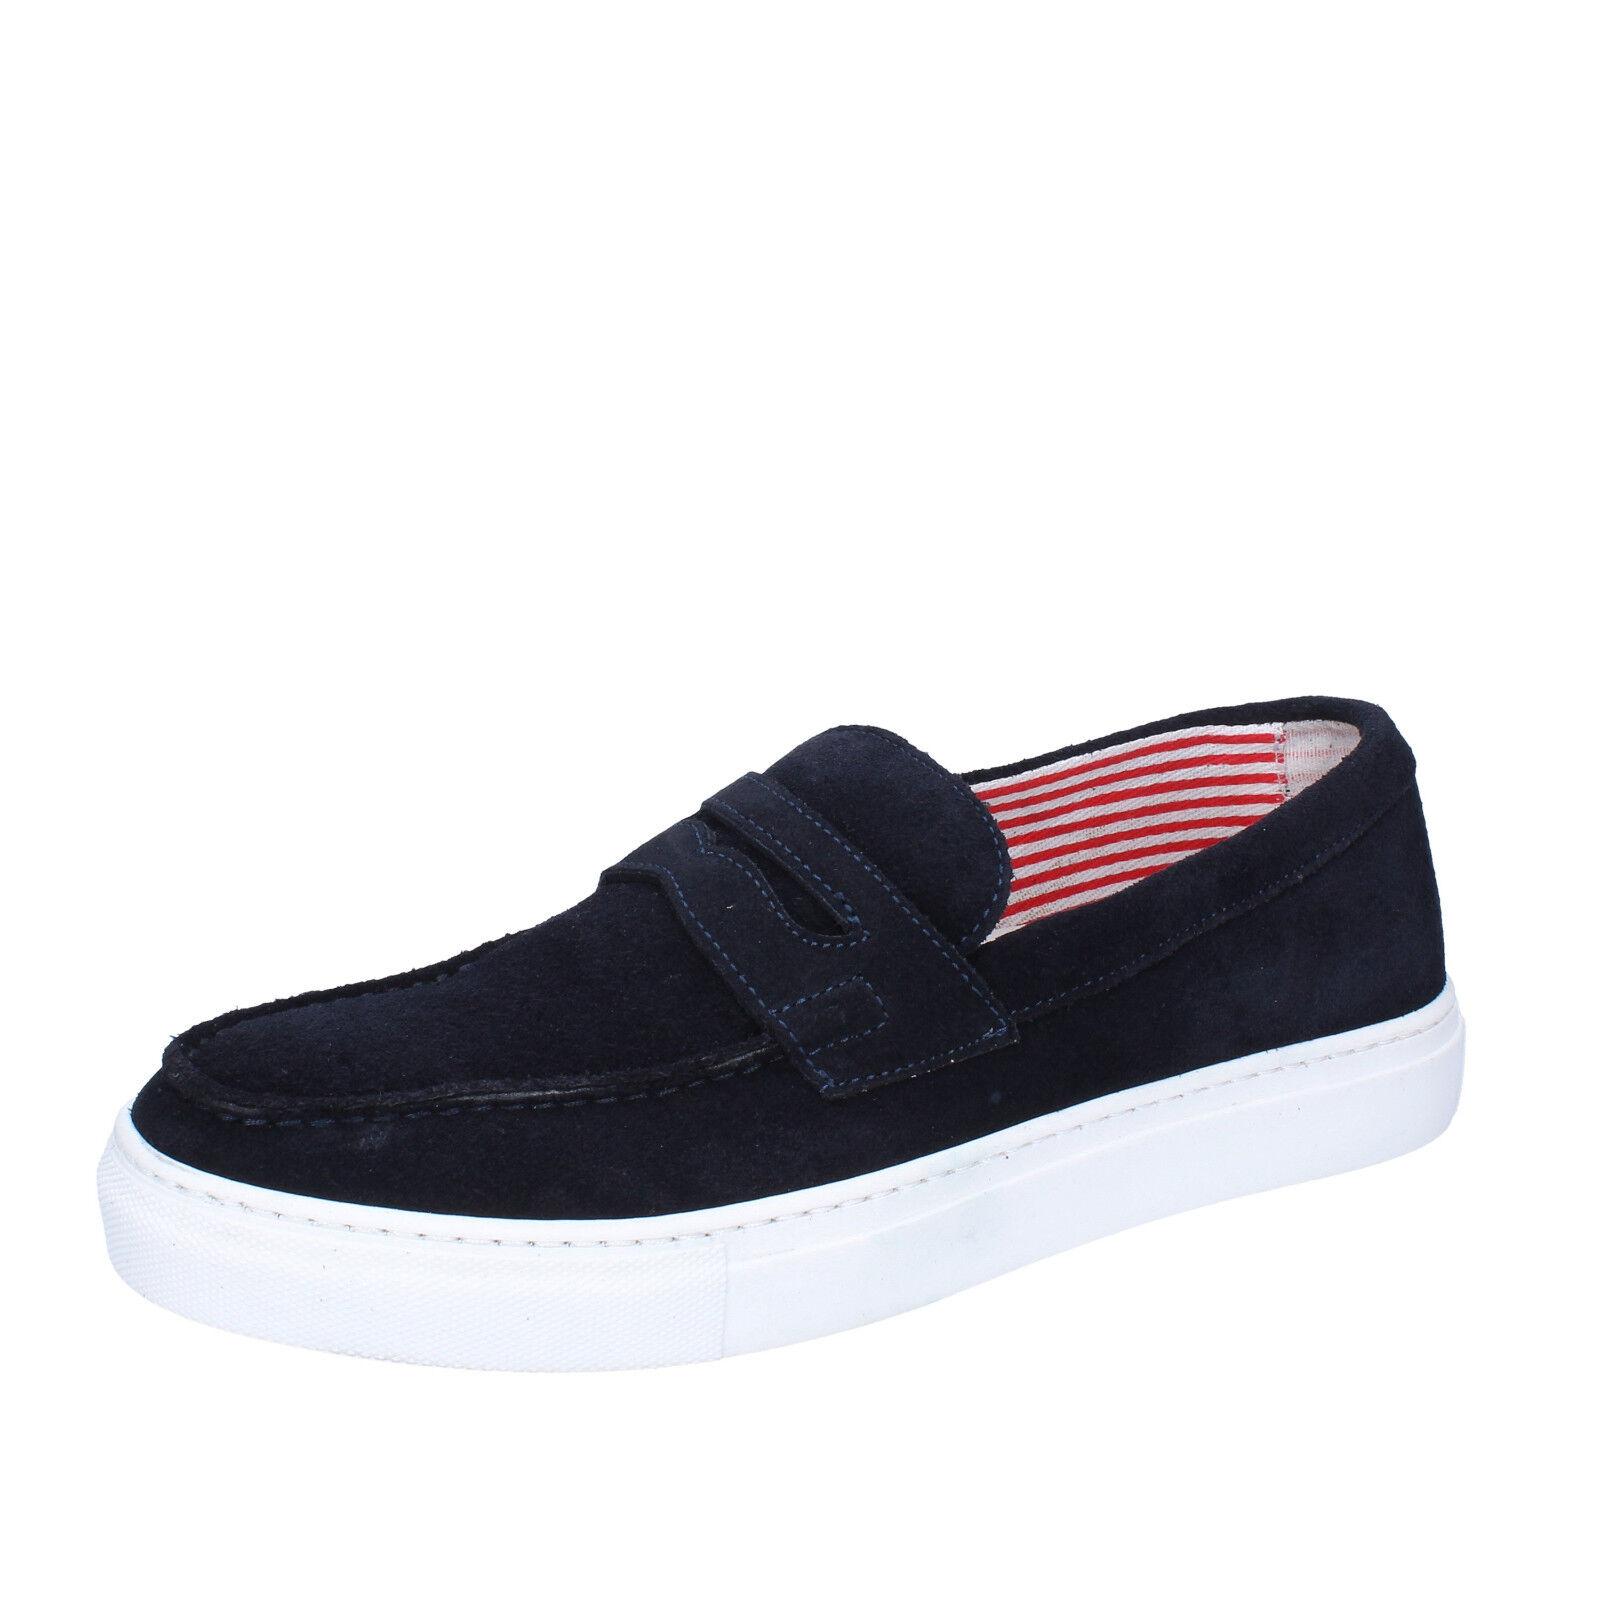 Men's shoes DI MELLA 9 (EU 42) loafers bluee suede AB996-C